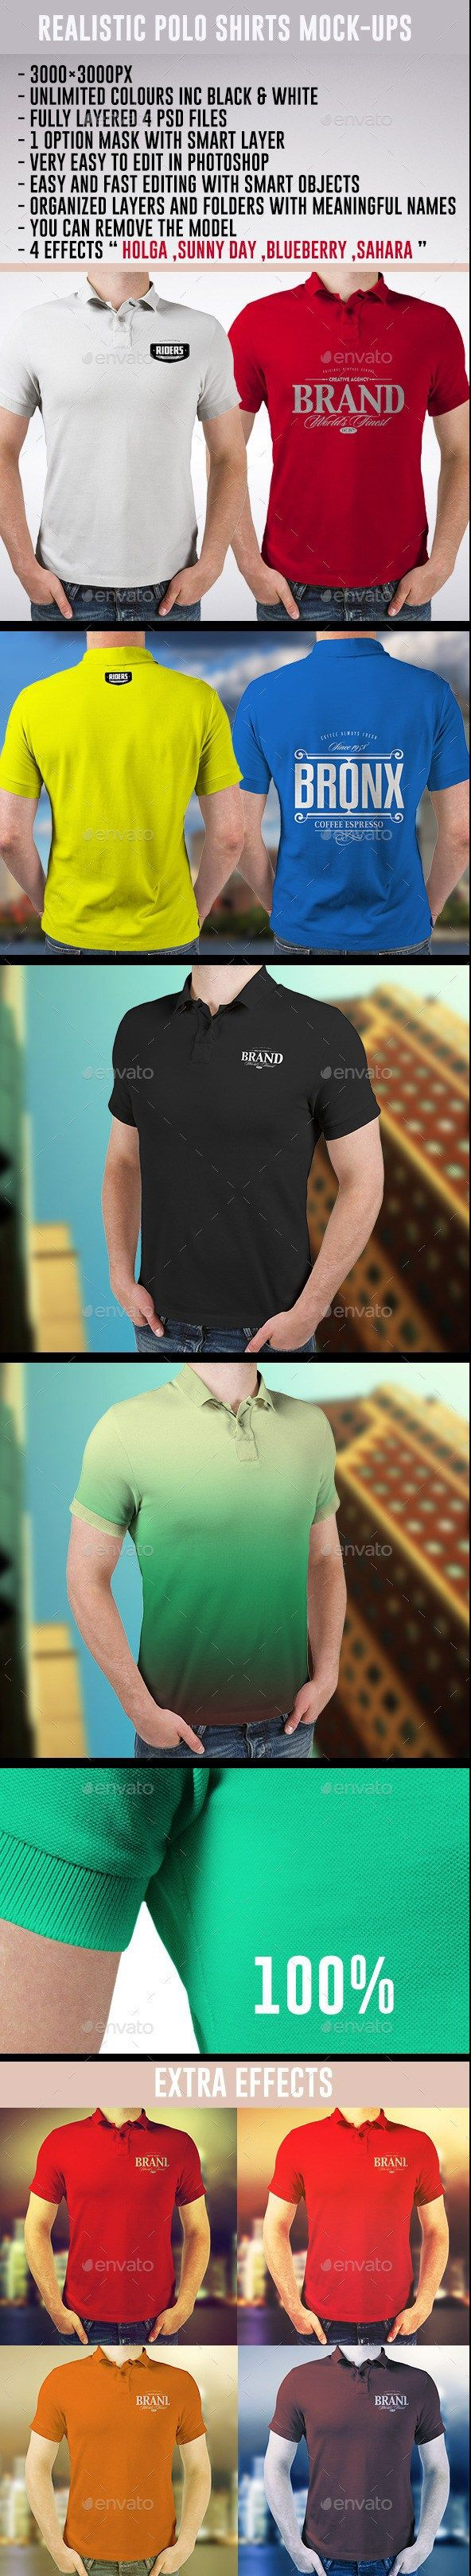 Scalable t shirt mockups more info - Realistic Polo Shirts Mock Ups T Shirts Apparel